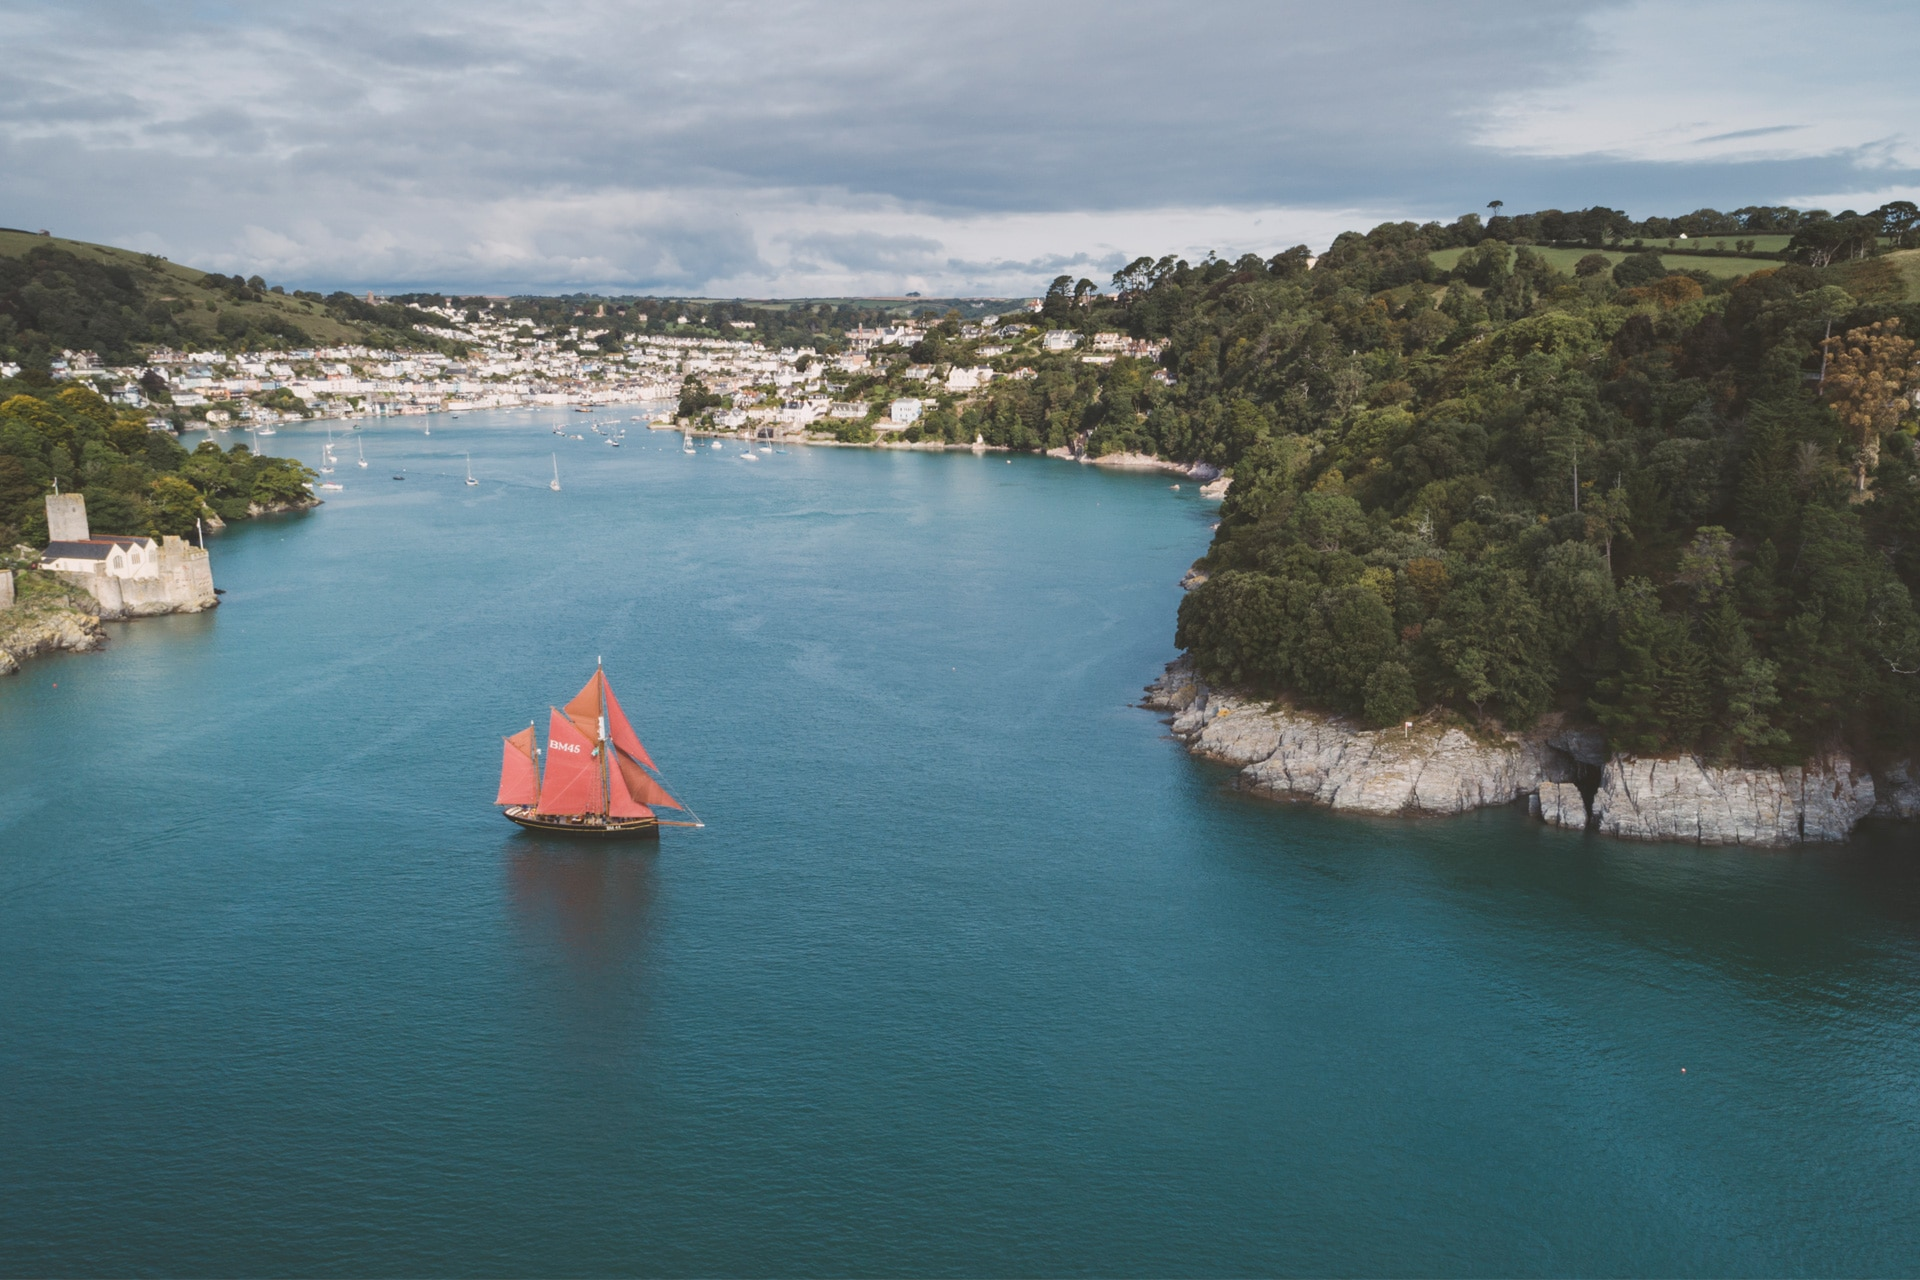 Pilgrim of Brixham sailing out of Dartmouth